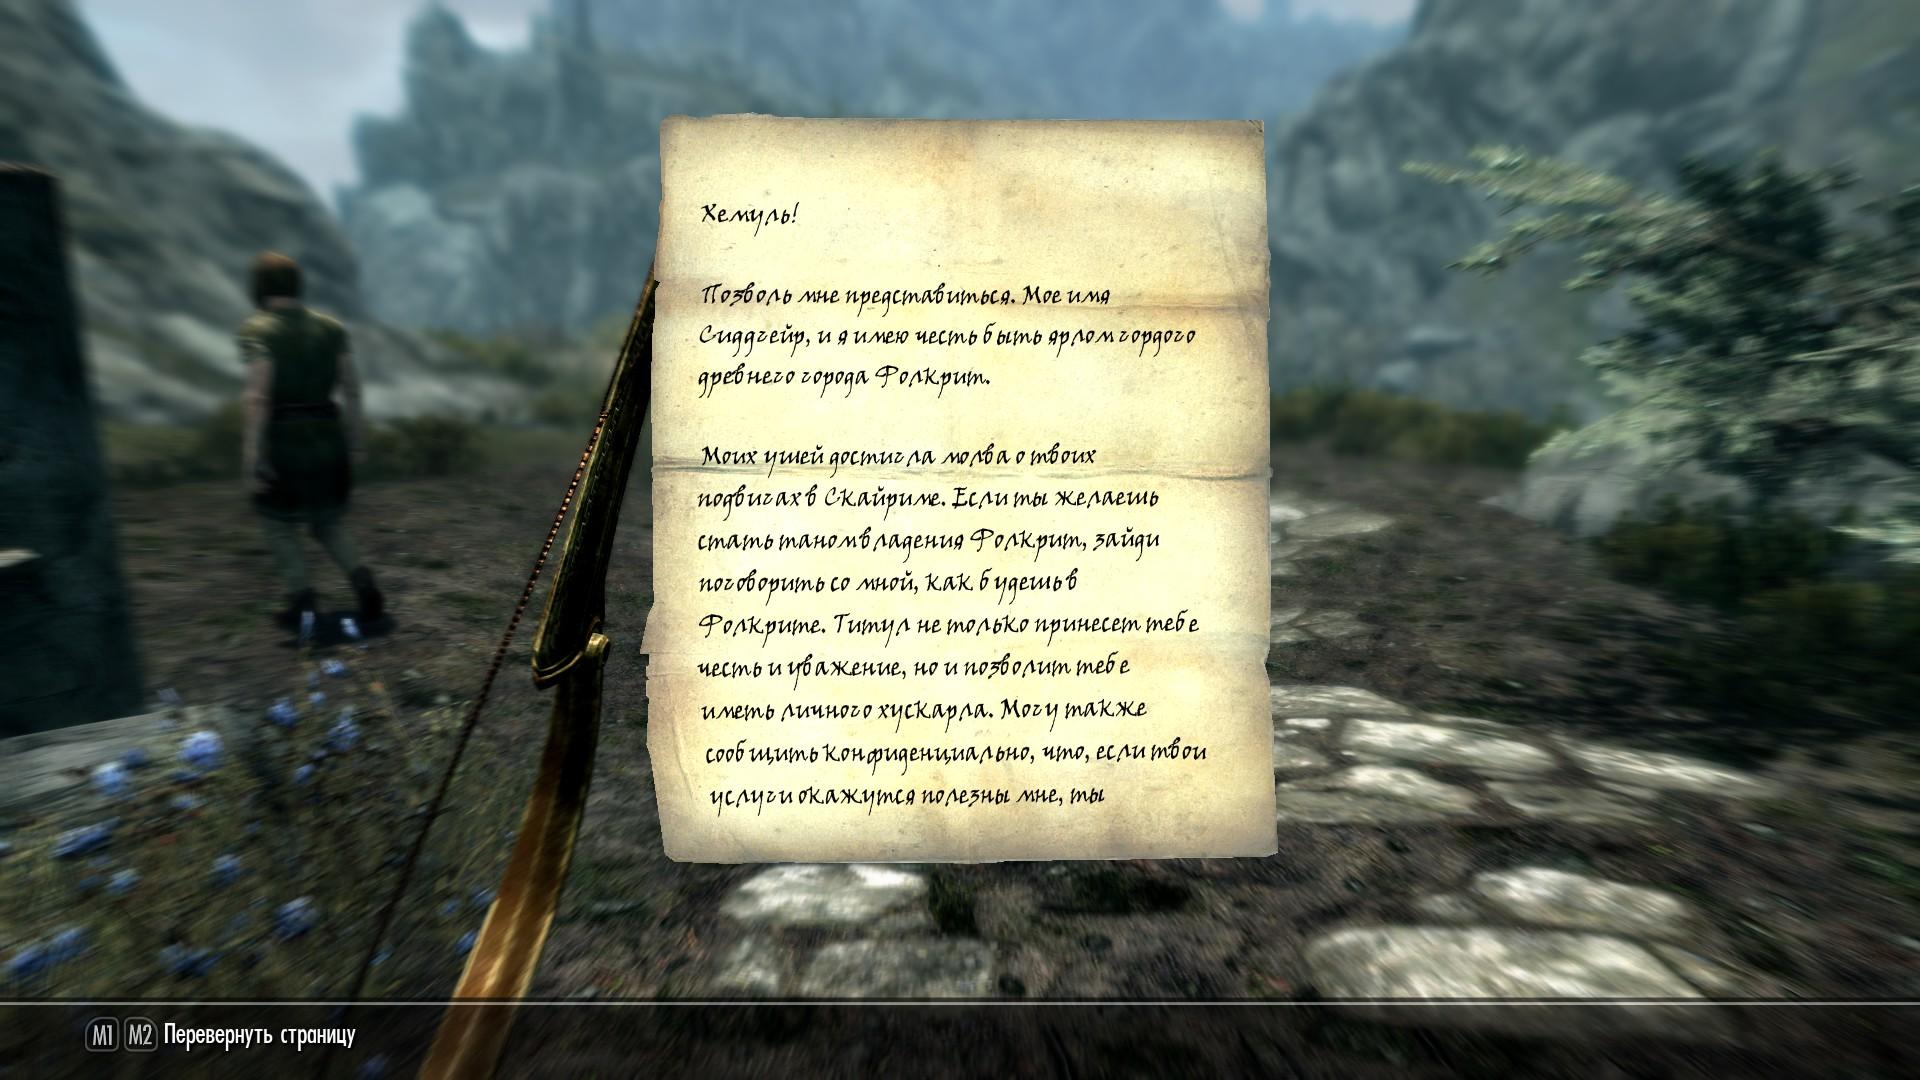 20180602185134_1.jpg - Elder Scrolls 5: Skyrim, the